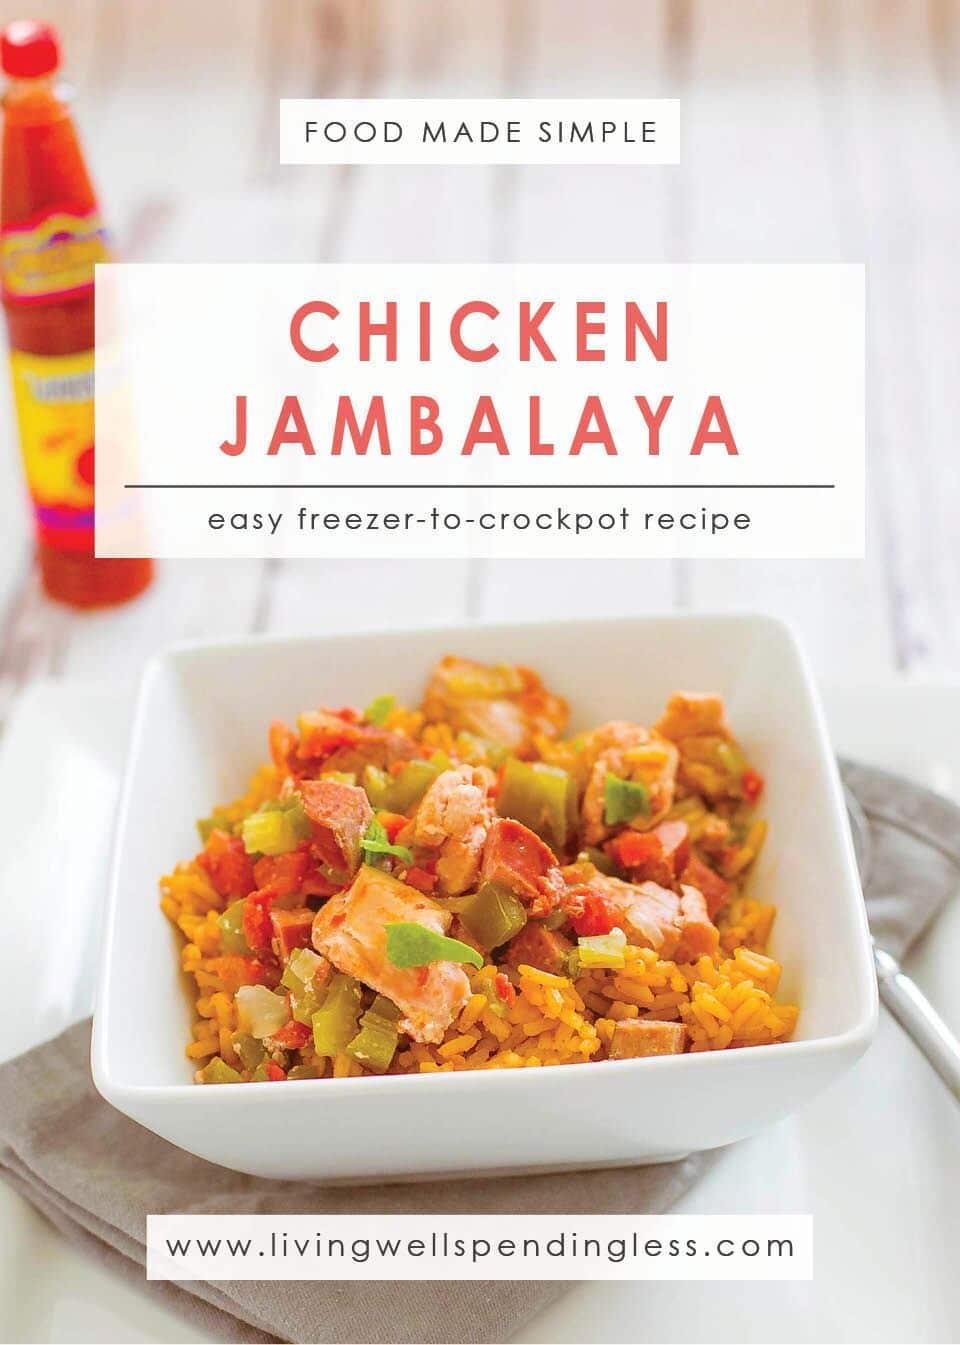 Easy Chicken Jambalaya: A Simple Freezer-to-Crockpot Recipe